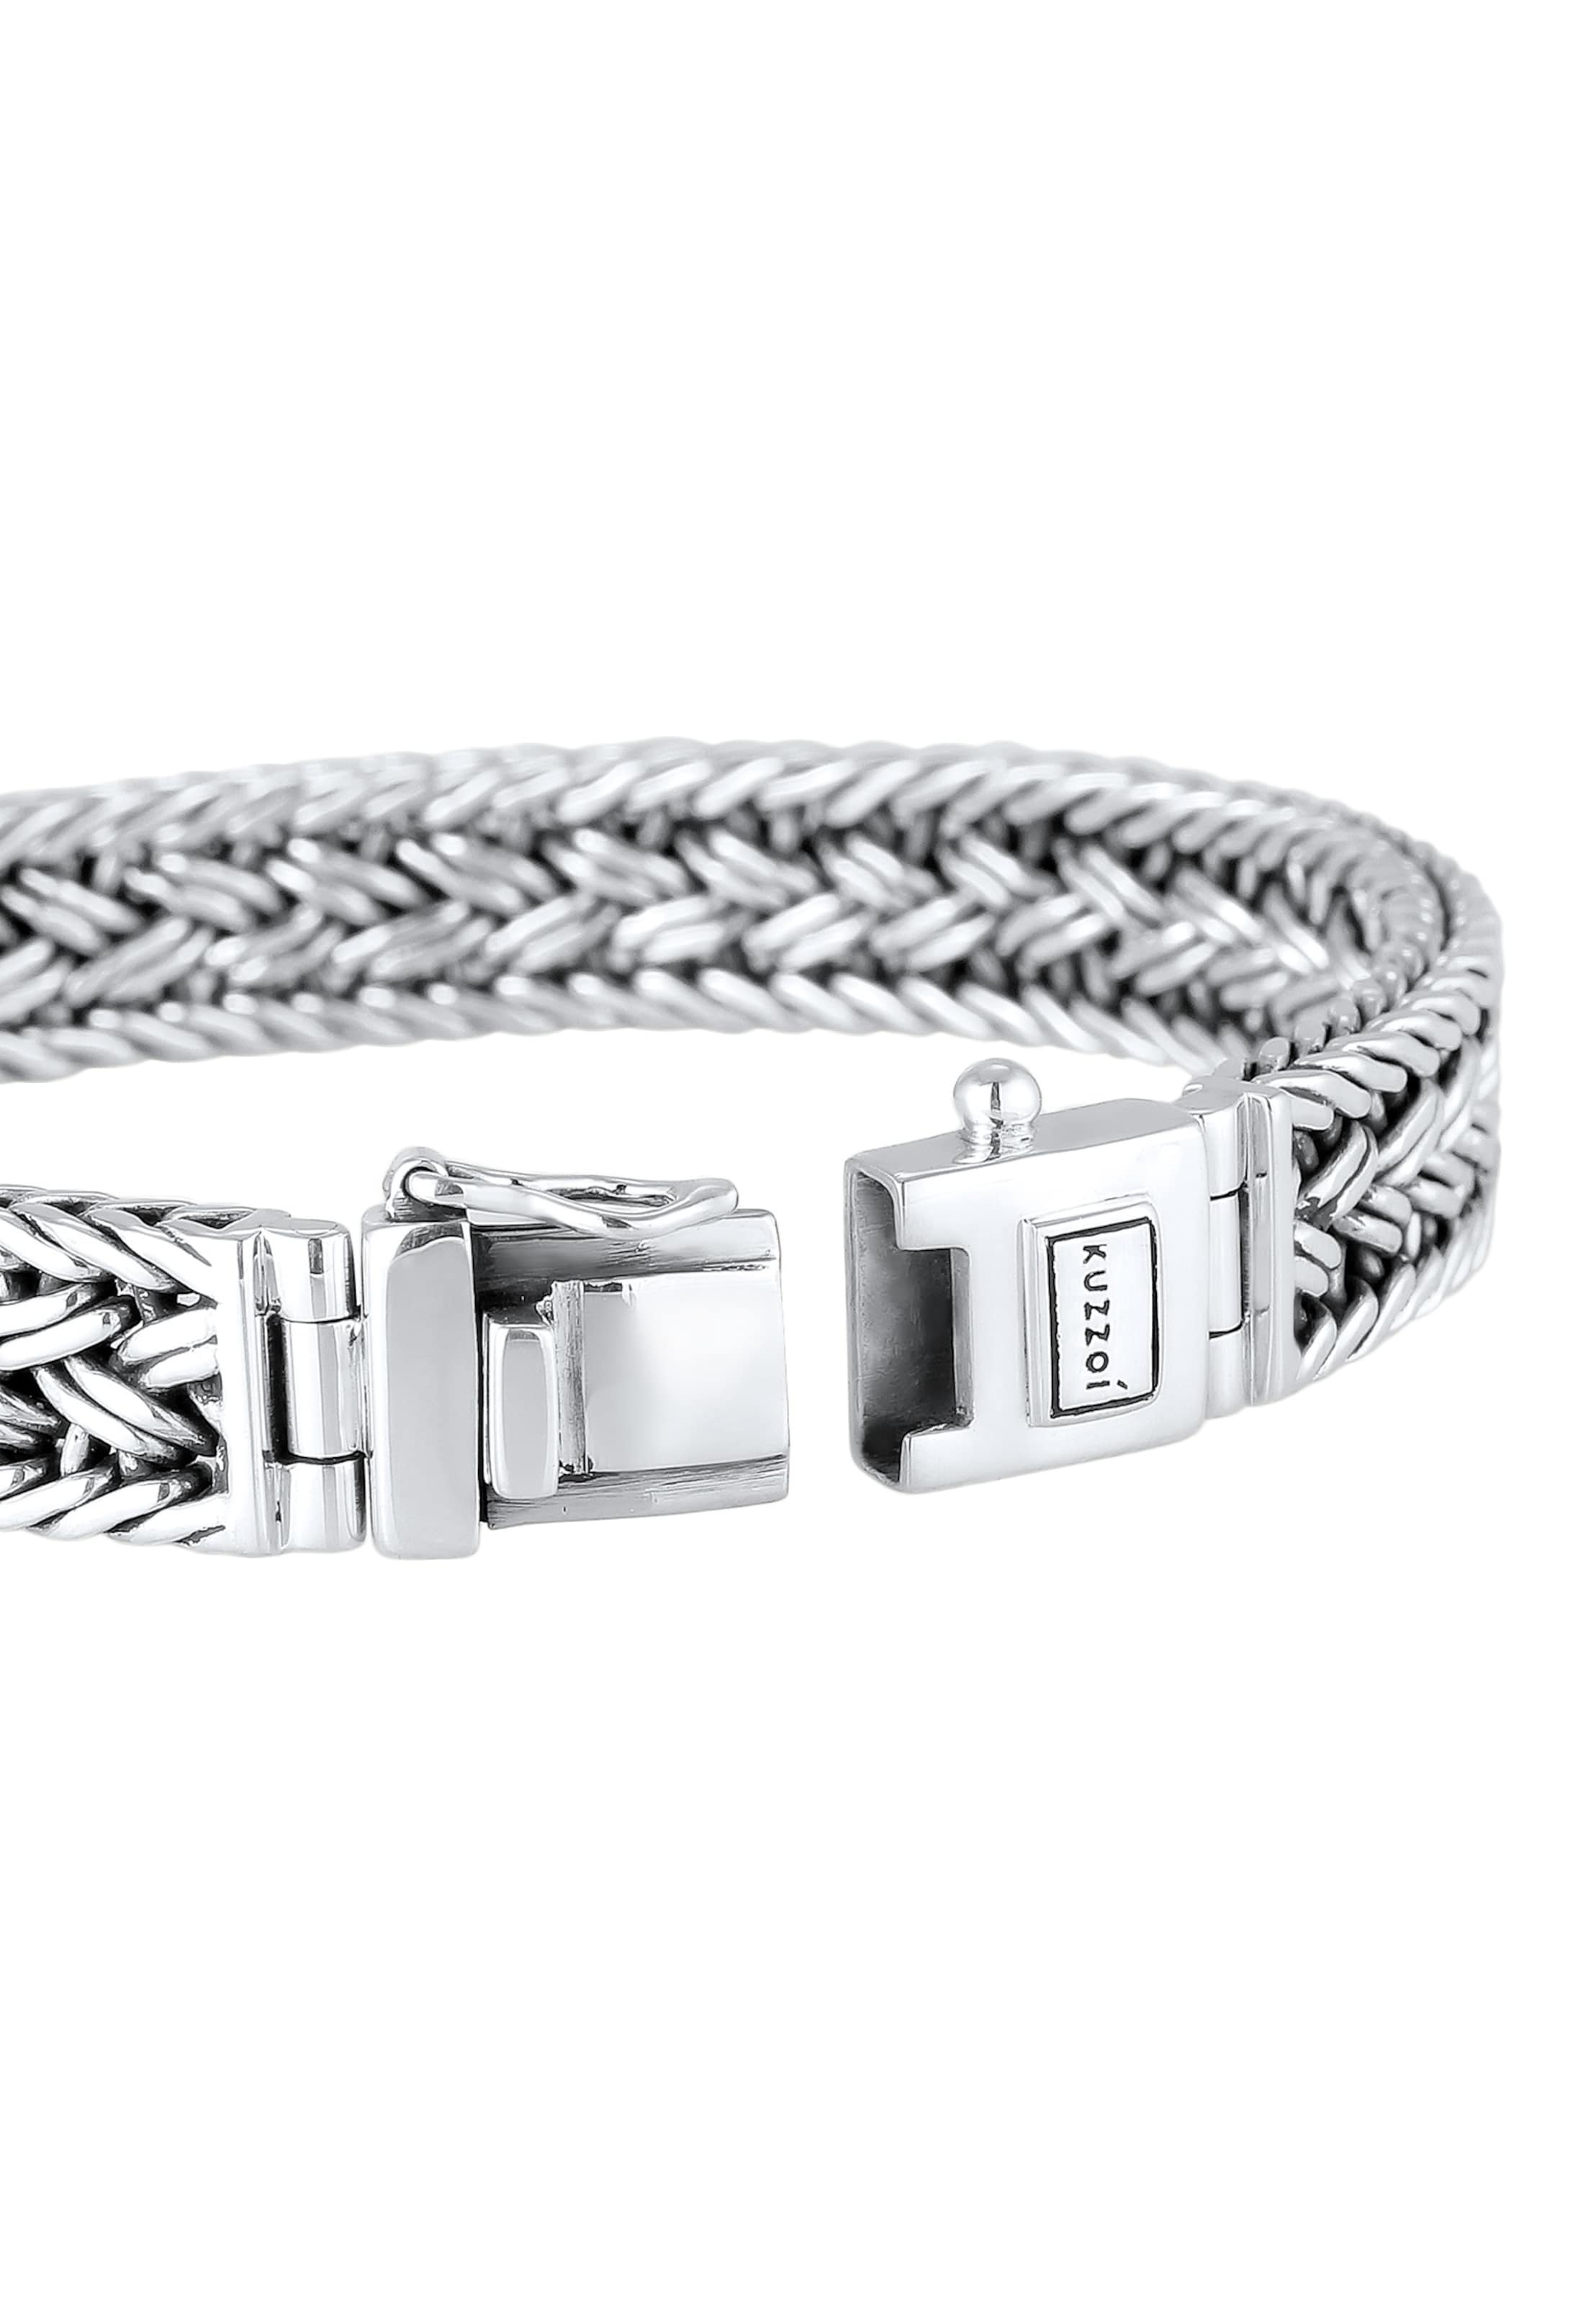 Armband Armband Kuzzoi Silber Kuzzoi In zMqUpGSV